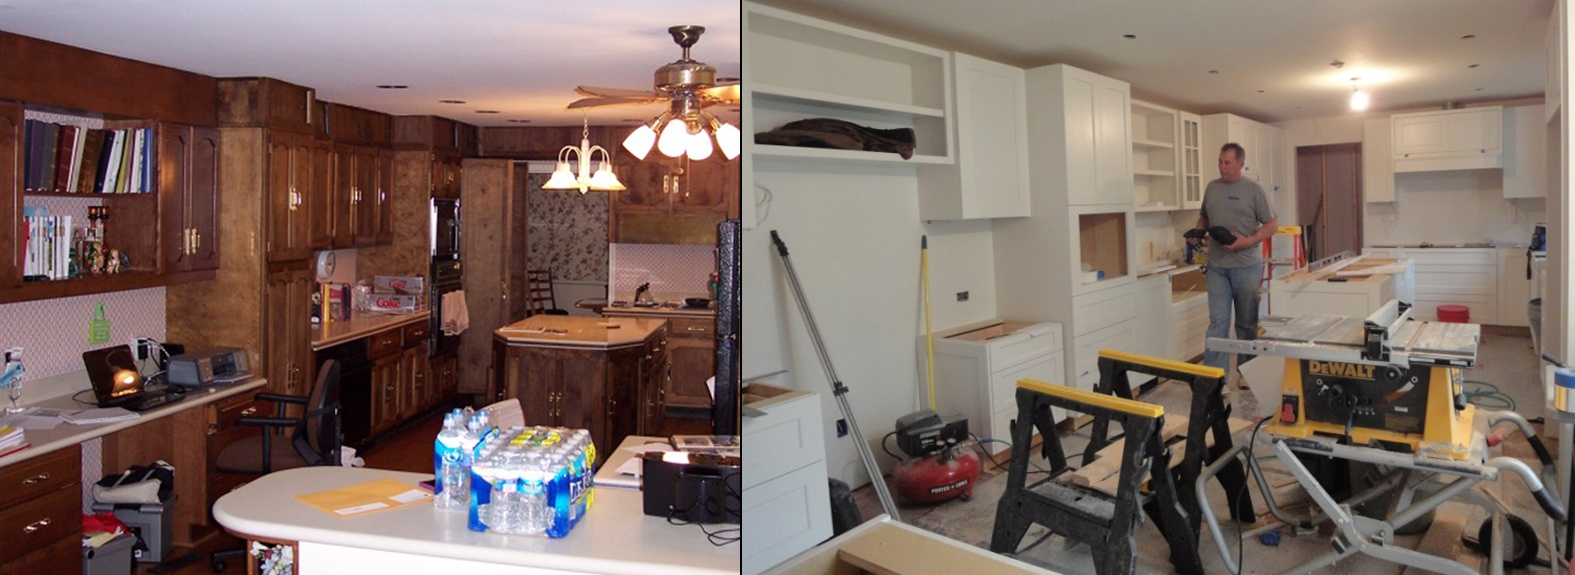 gilday renovations kitchen remodel in progress